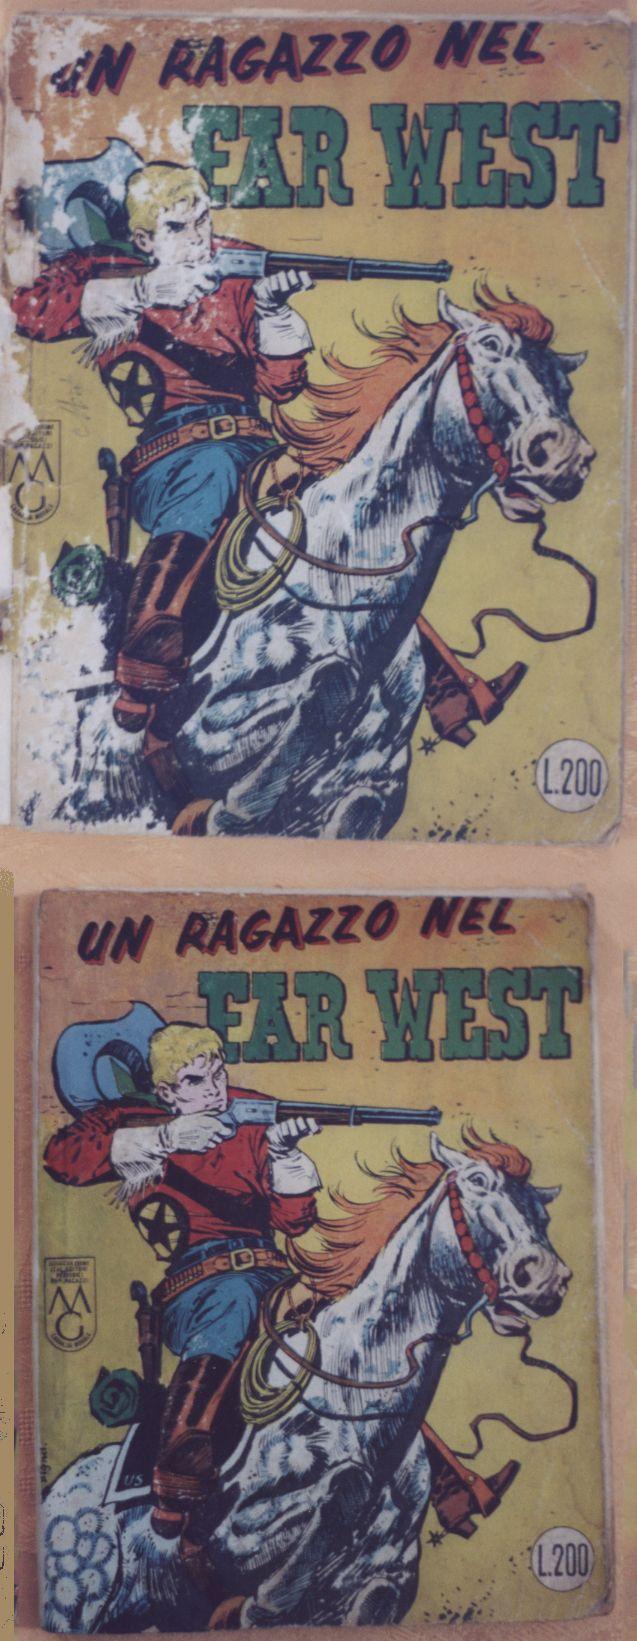 RESTAURO ZENITH GIGANTE N° 23 UN RAGAZZO NEL FAR WEST n° 1 www.atelierdangelone.it